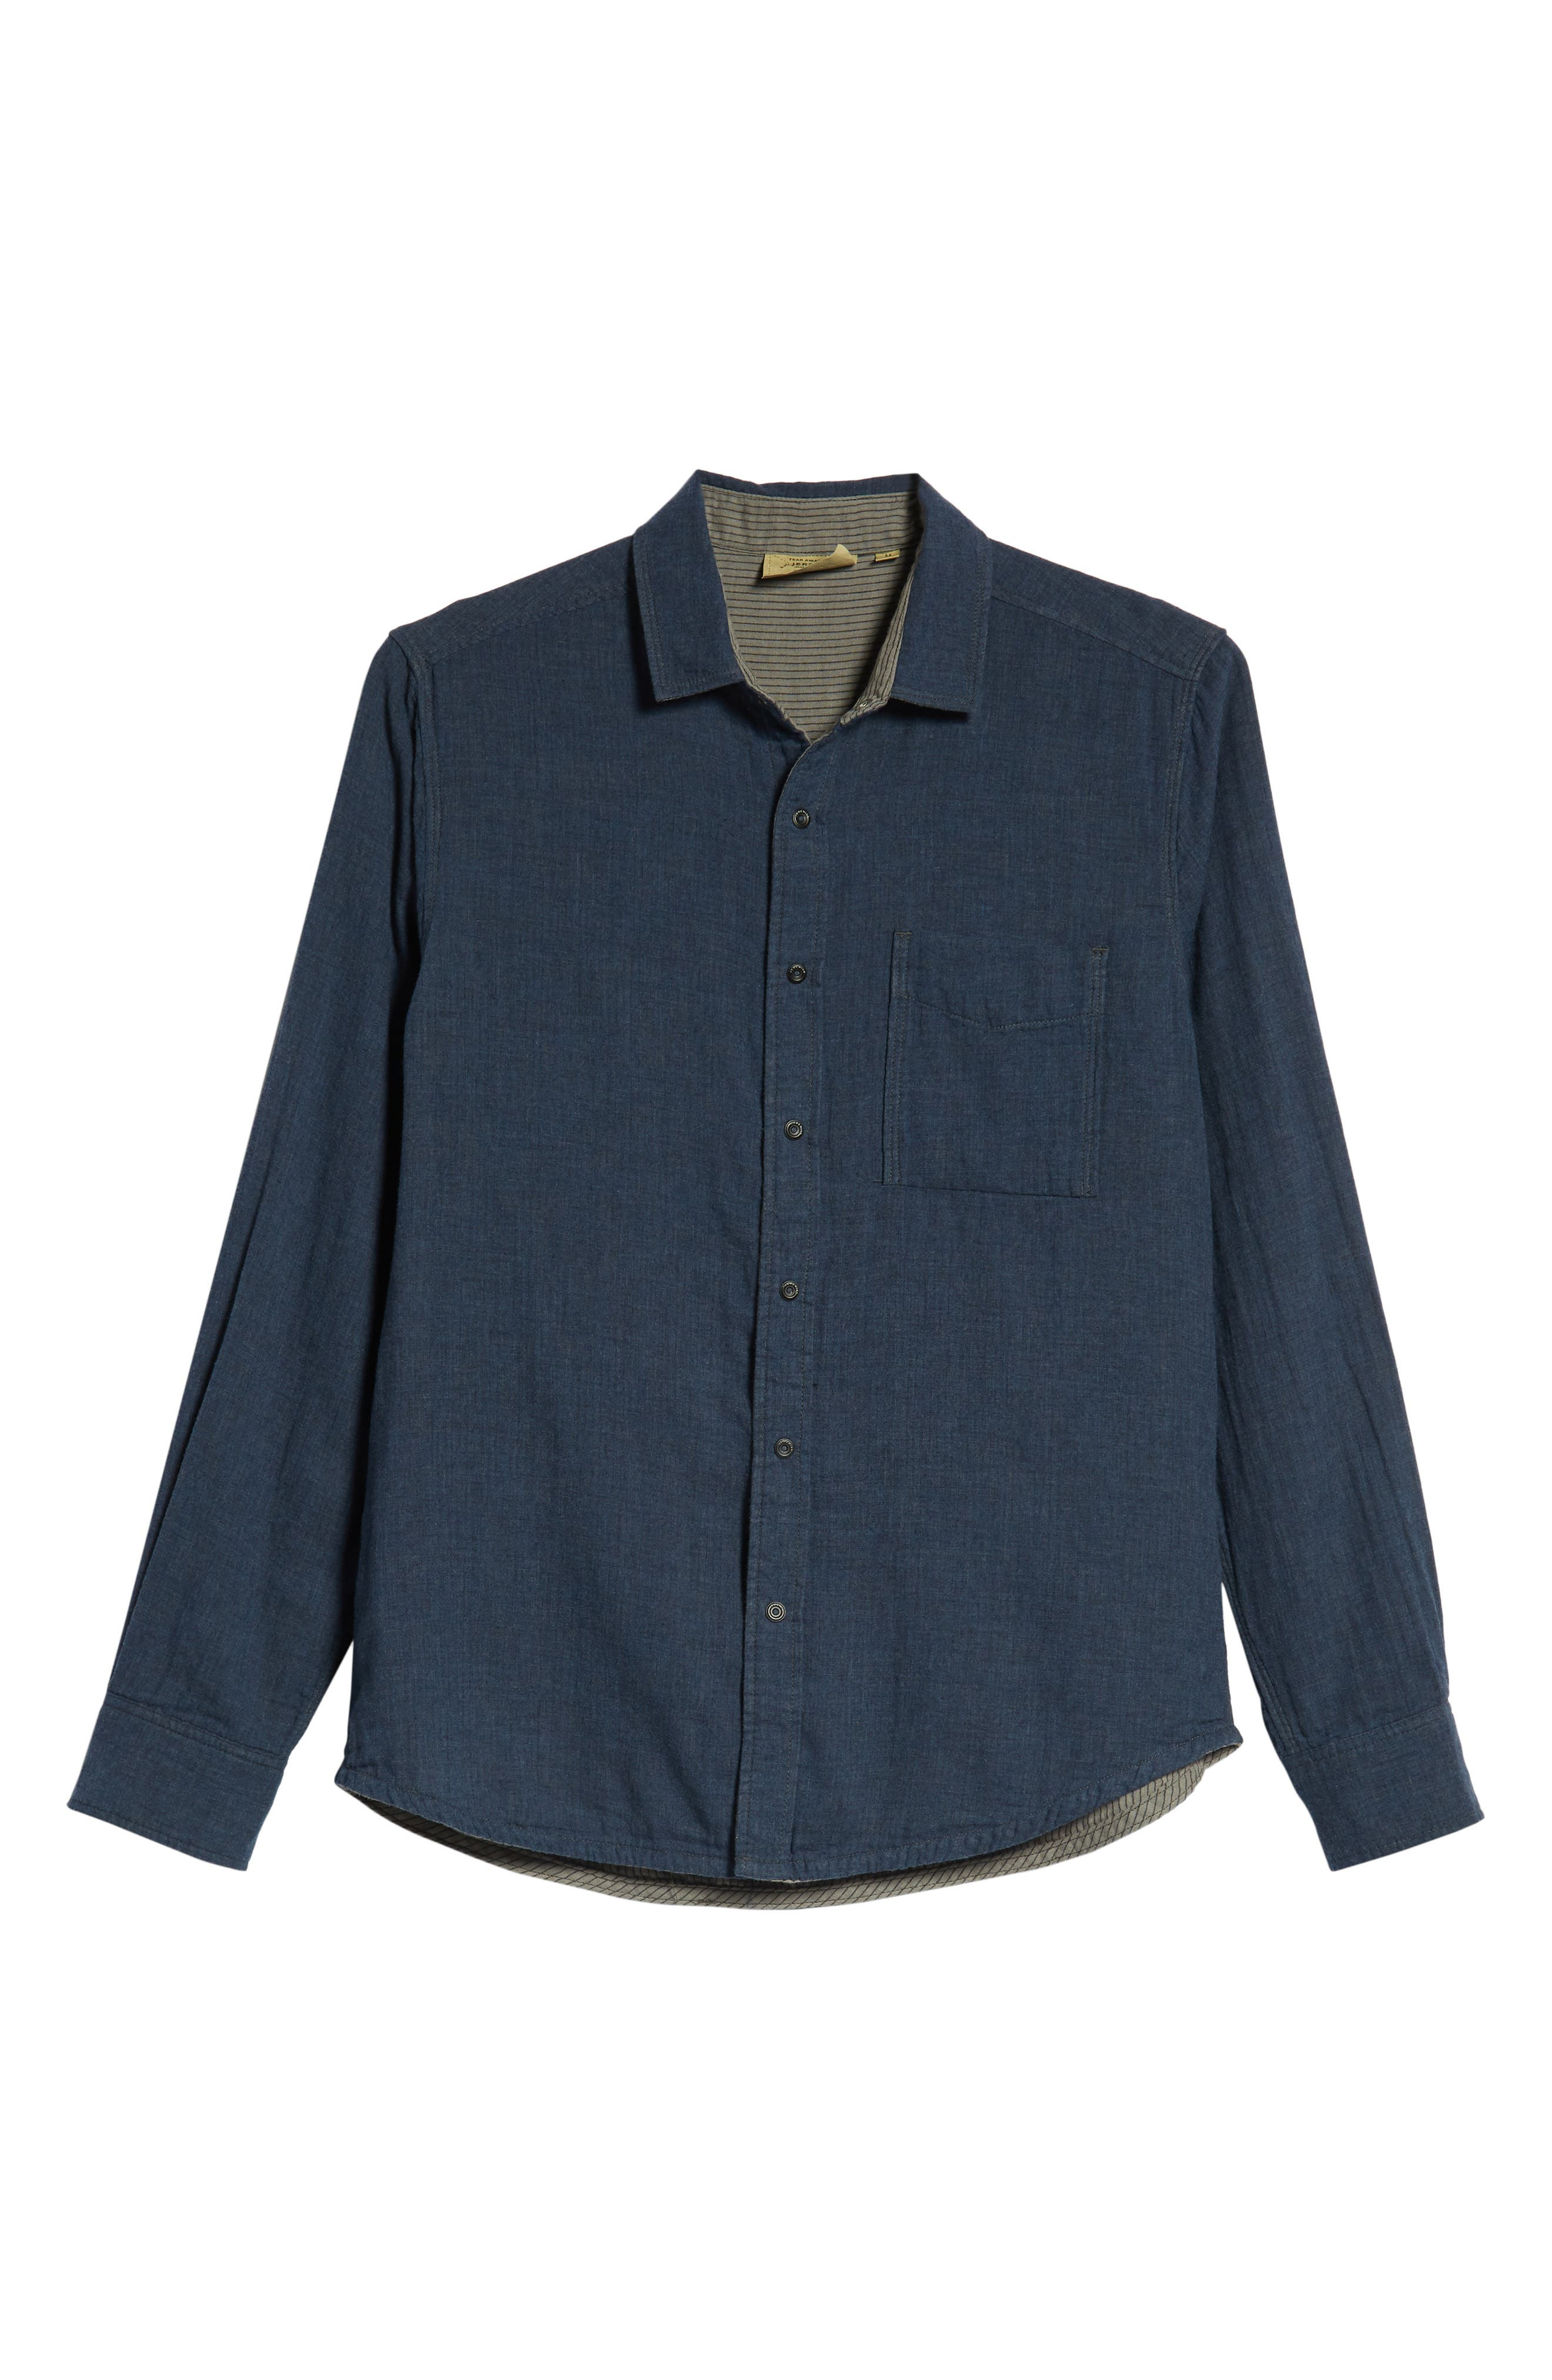 Howler Regular Fit Reversible Sport Shirt,                             Alternate thumbnail 6, color,                             LEGION BLUE HEATHER